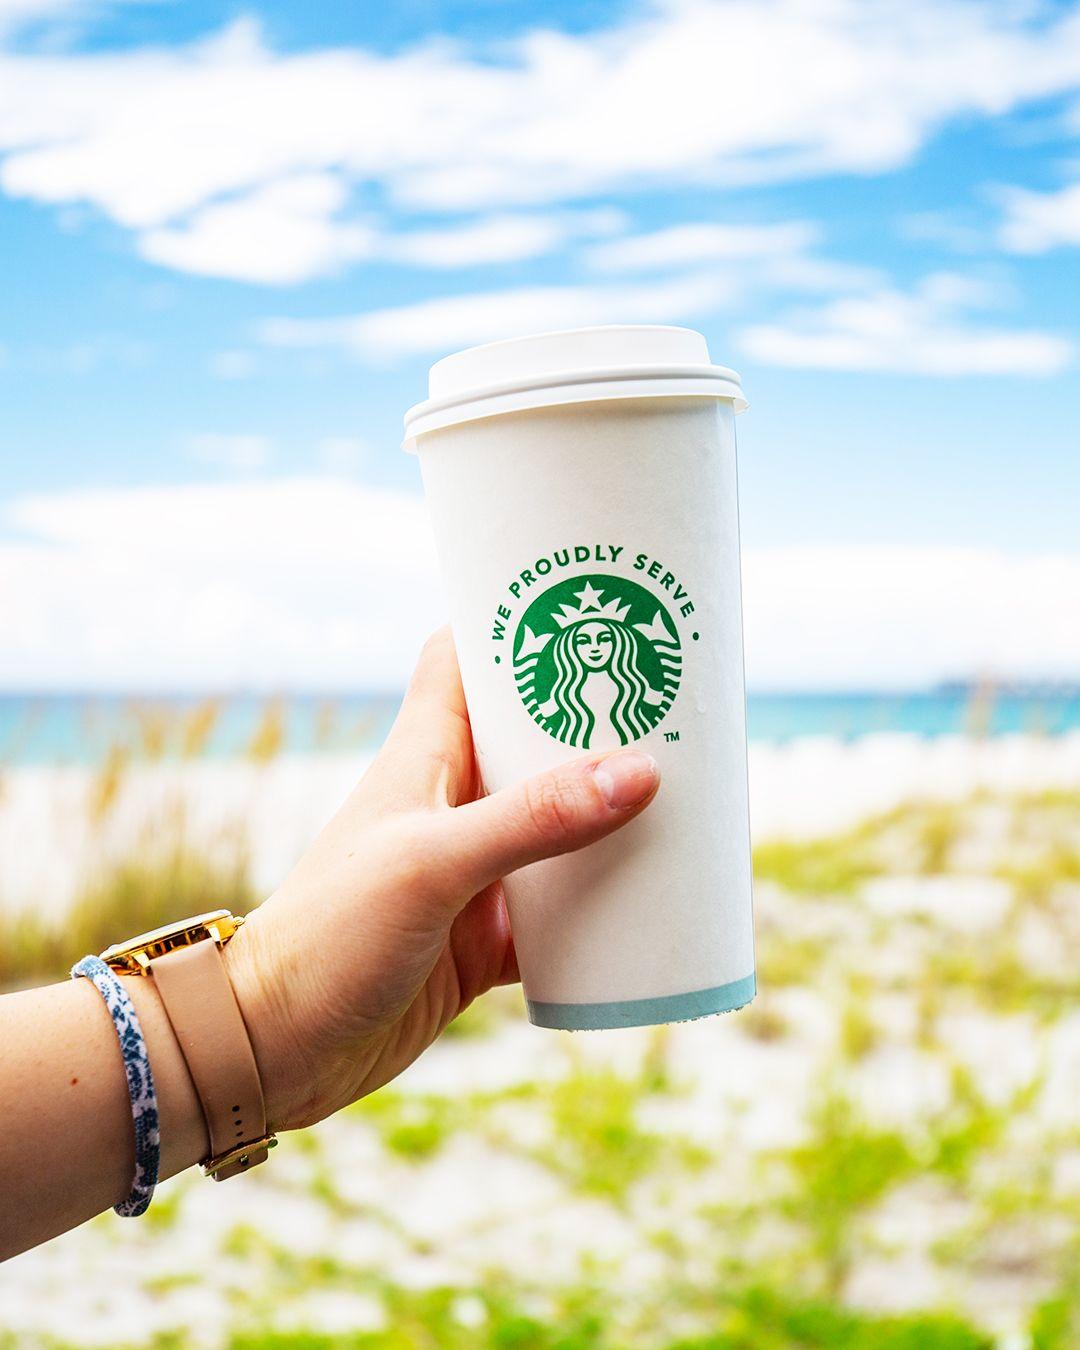 Cafe Proudly Brews Starbucks Coffee